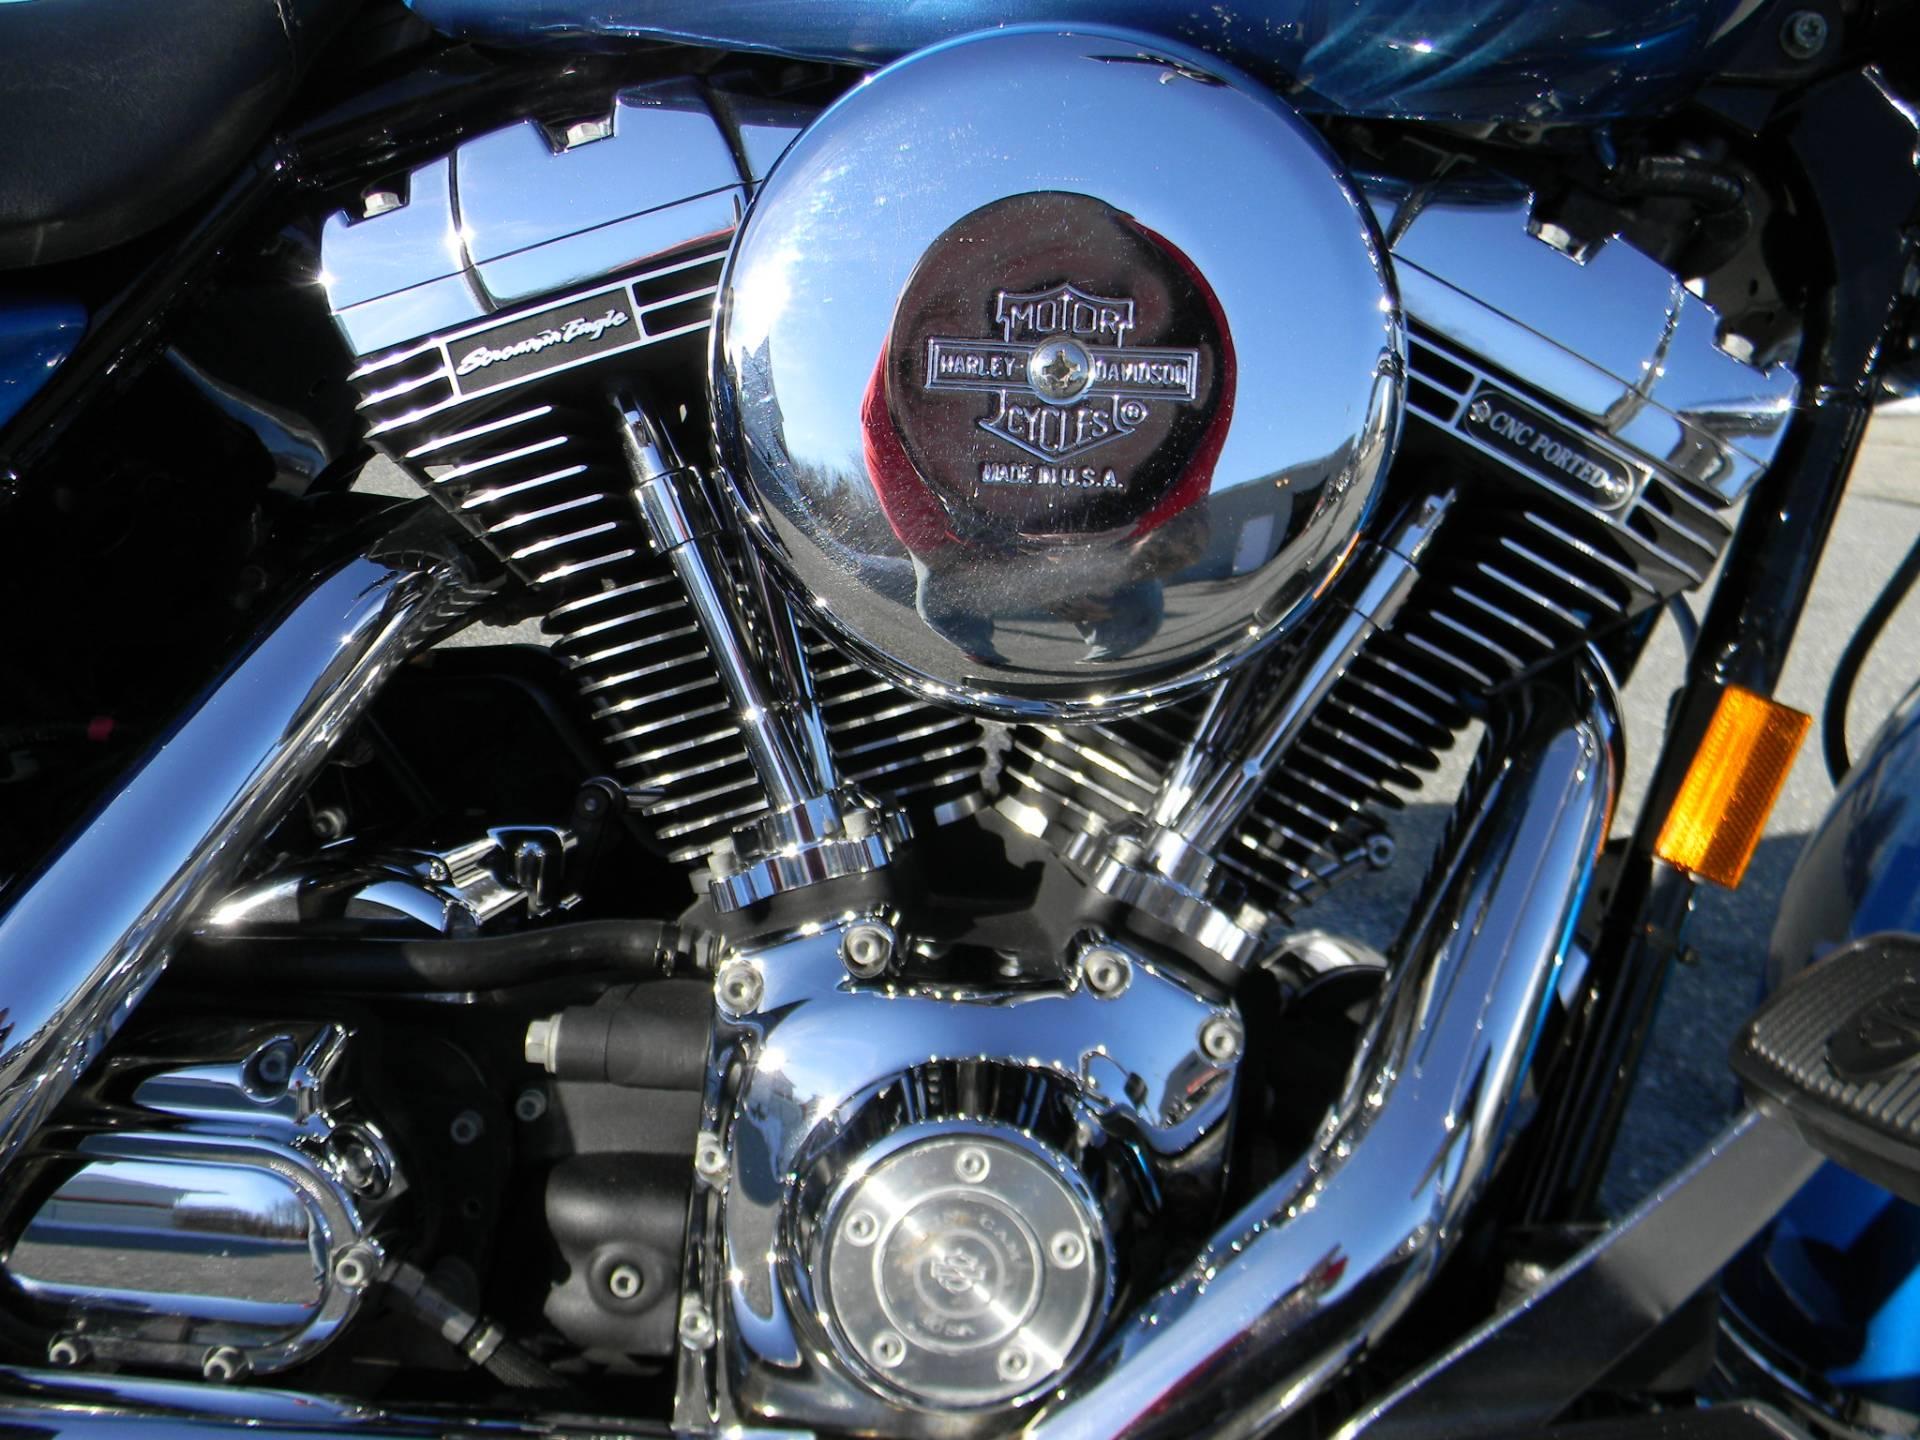 2006 Harley-Davidson Road King® Classic in Springfield, Massachusetts